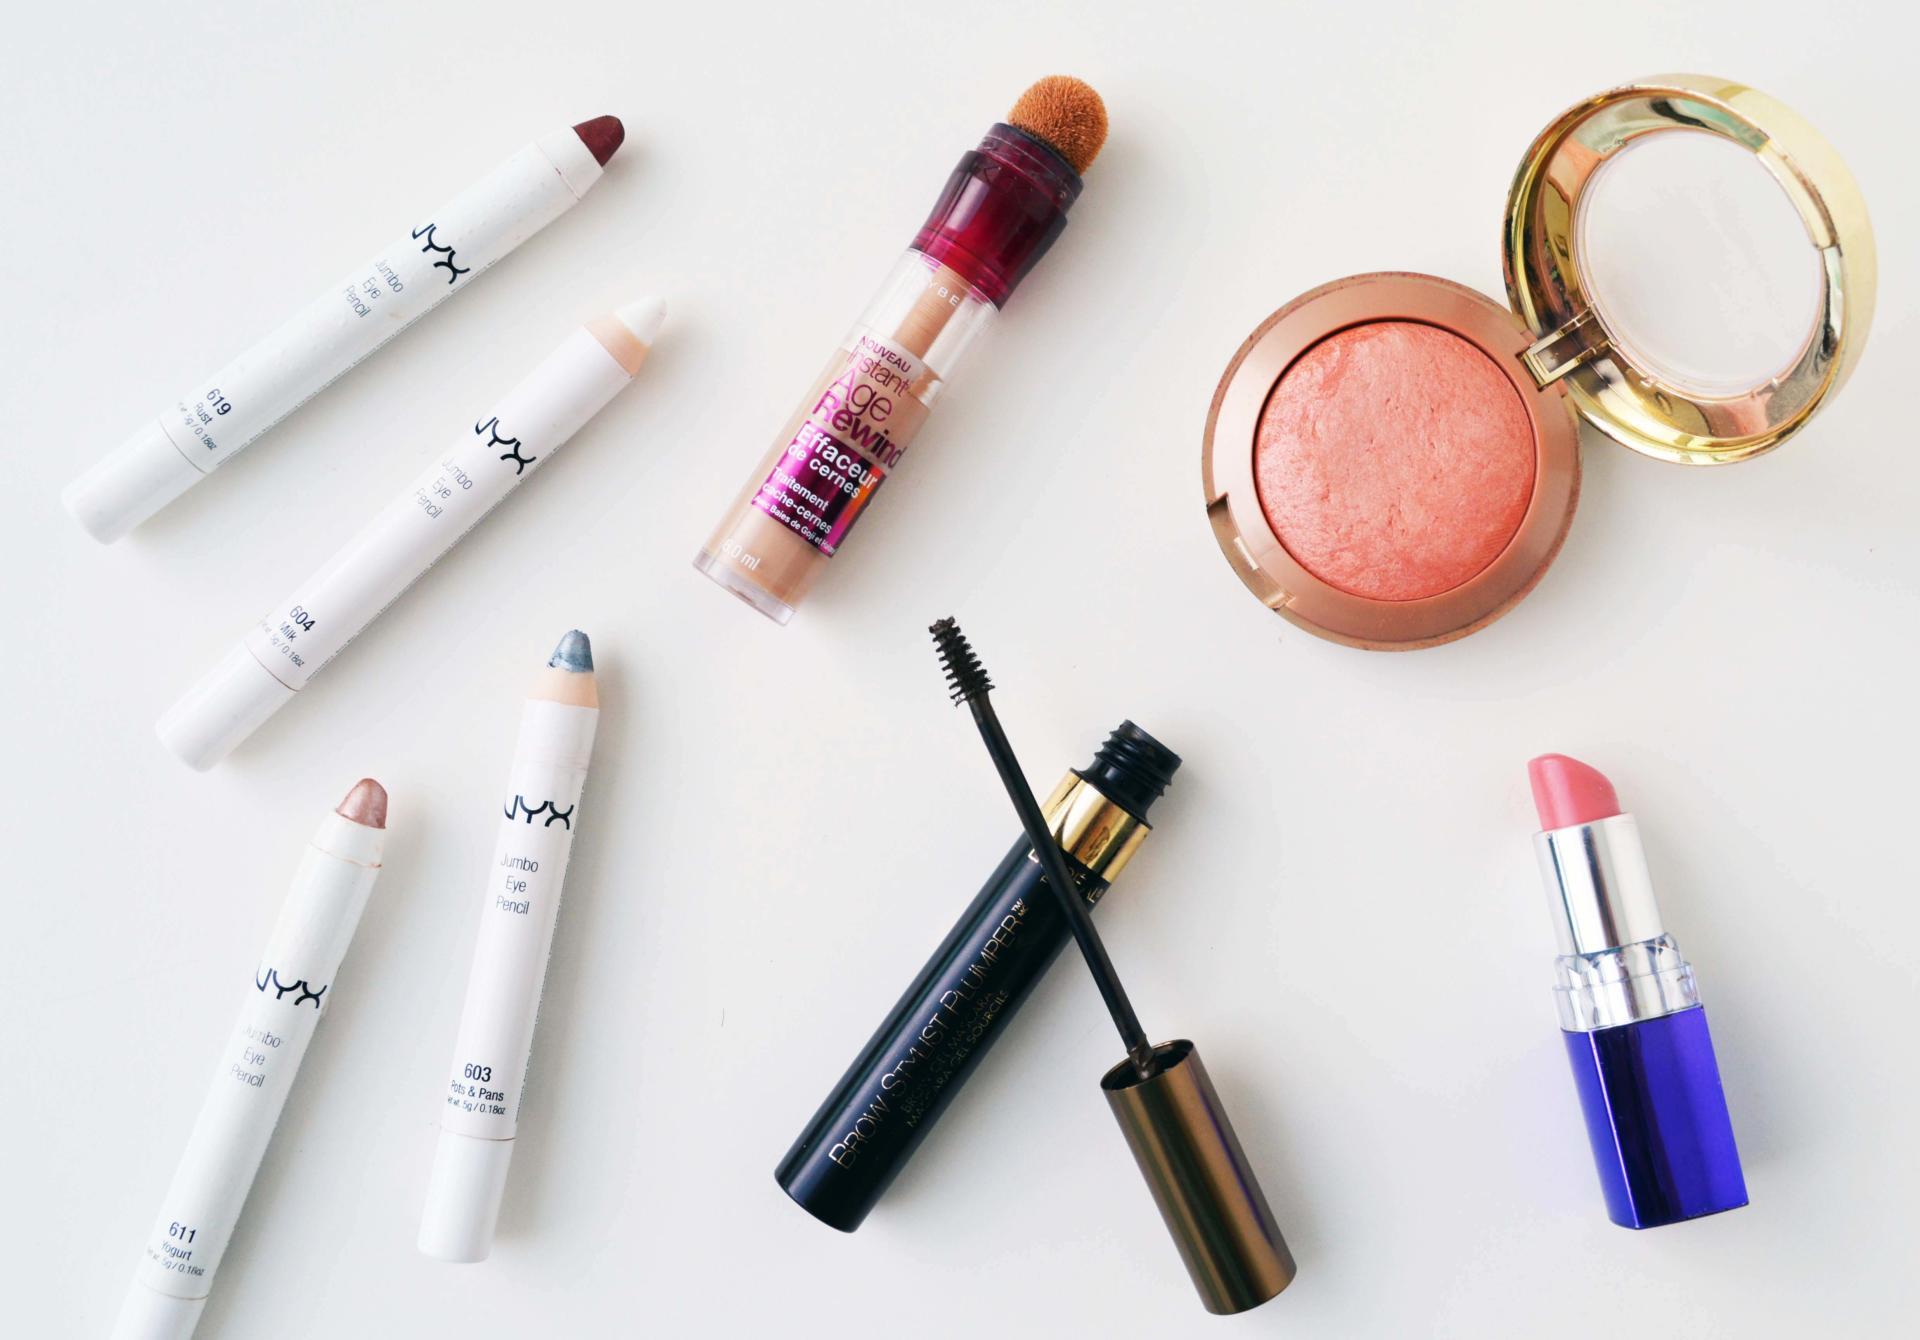 Top 5 | Drugstore Makeup